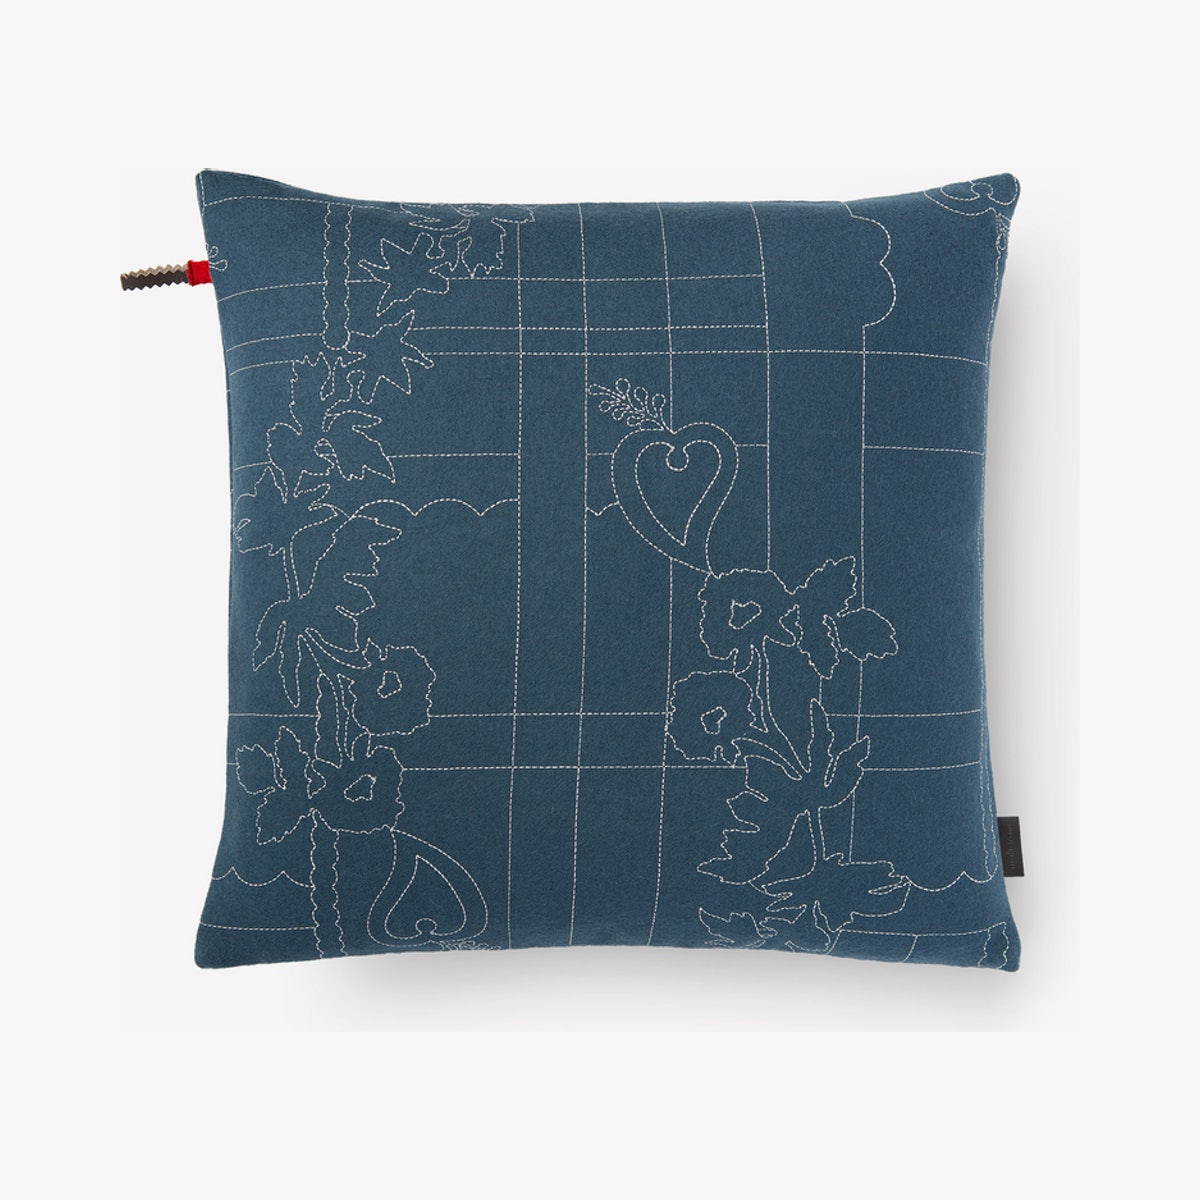 Layers Park Pillow